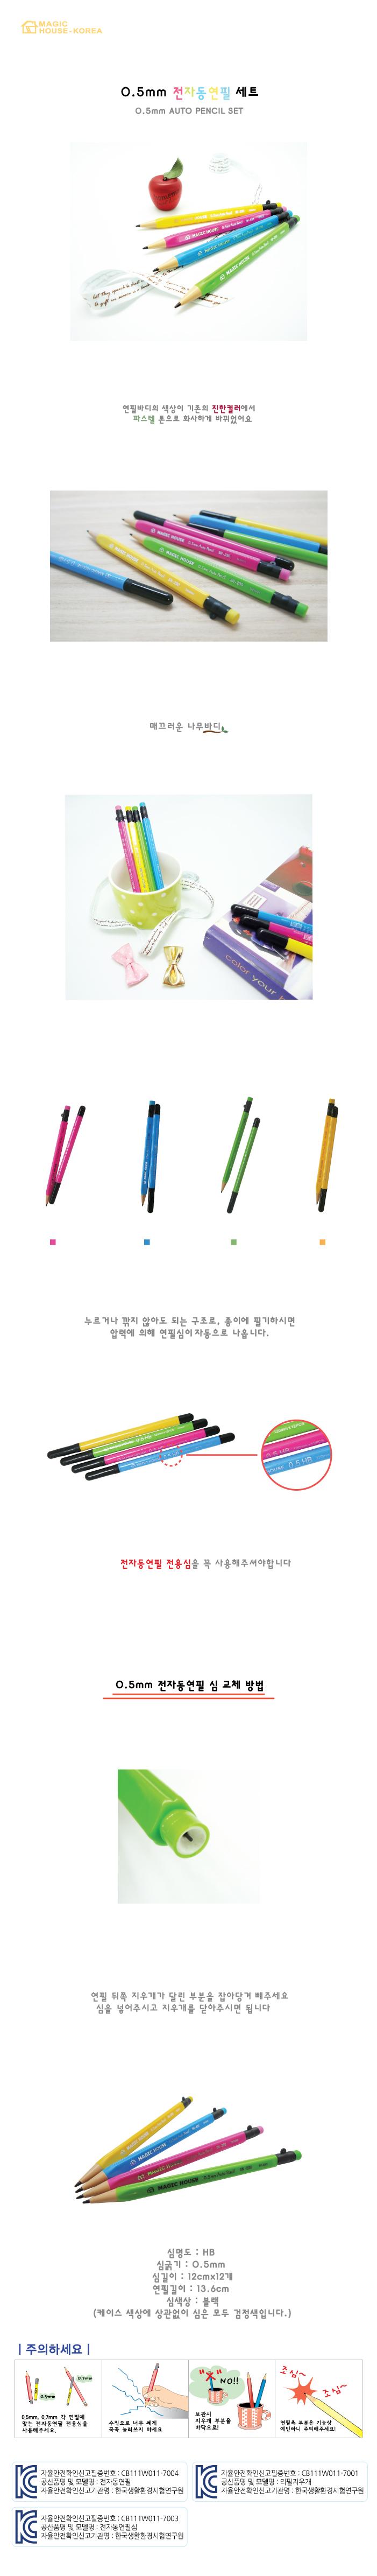 0.5mm 전자동연필-파스텔color SET - 매직하우스, 3,400원, 연필, 자동/기능성연필